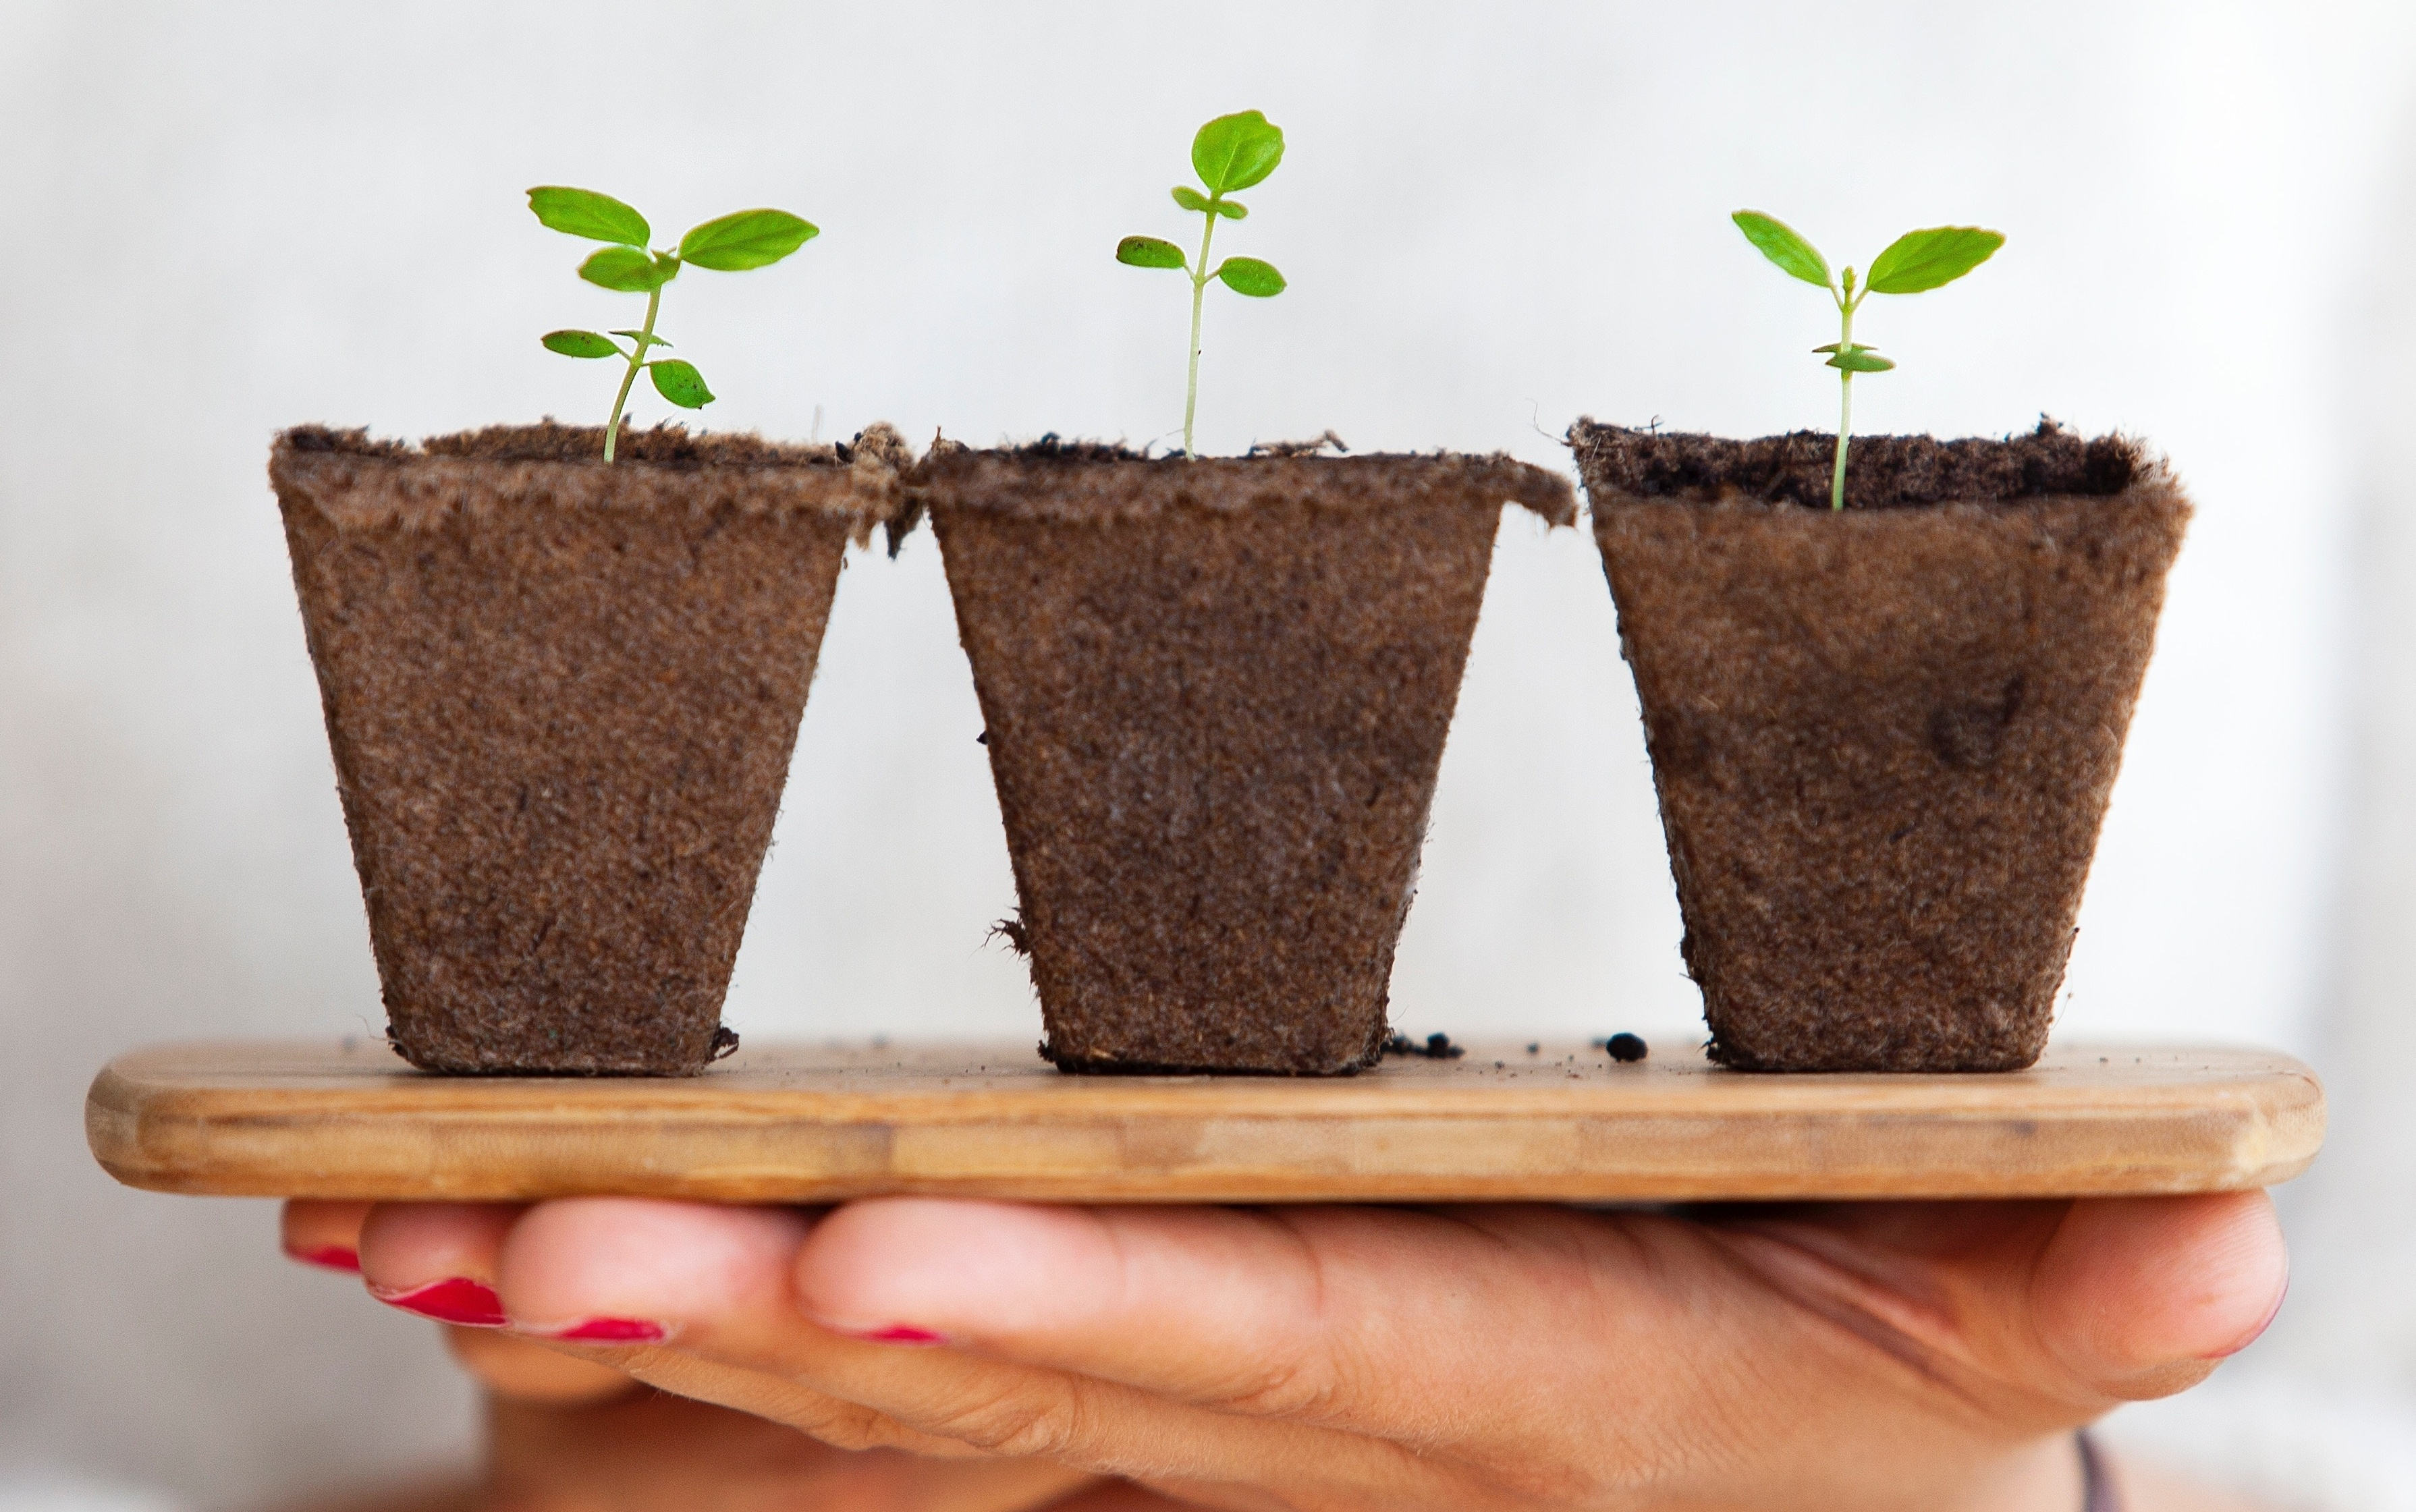 why is lead nurturing so important in B2B